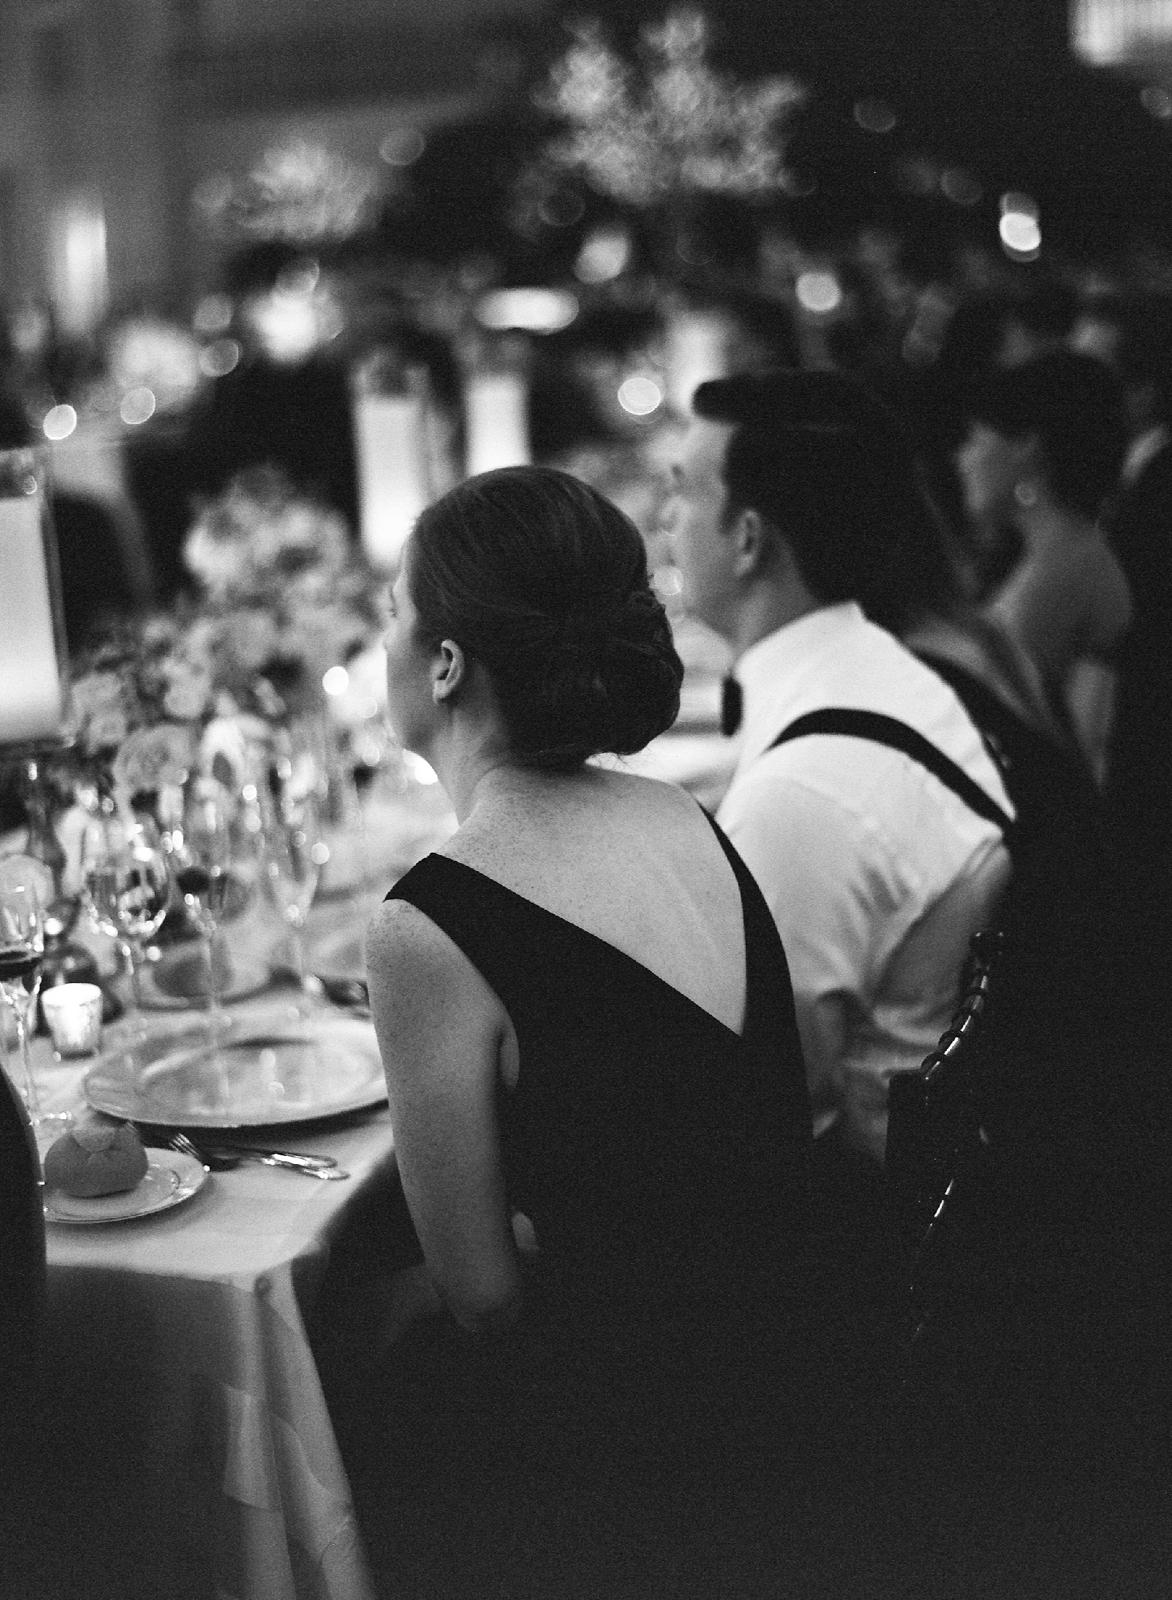 atrium at curtis center wedding photographer philadelphia wedding photographer shannon griffin_0045.jpg